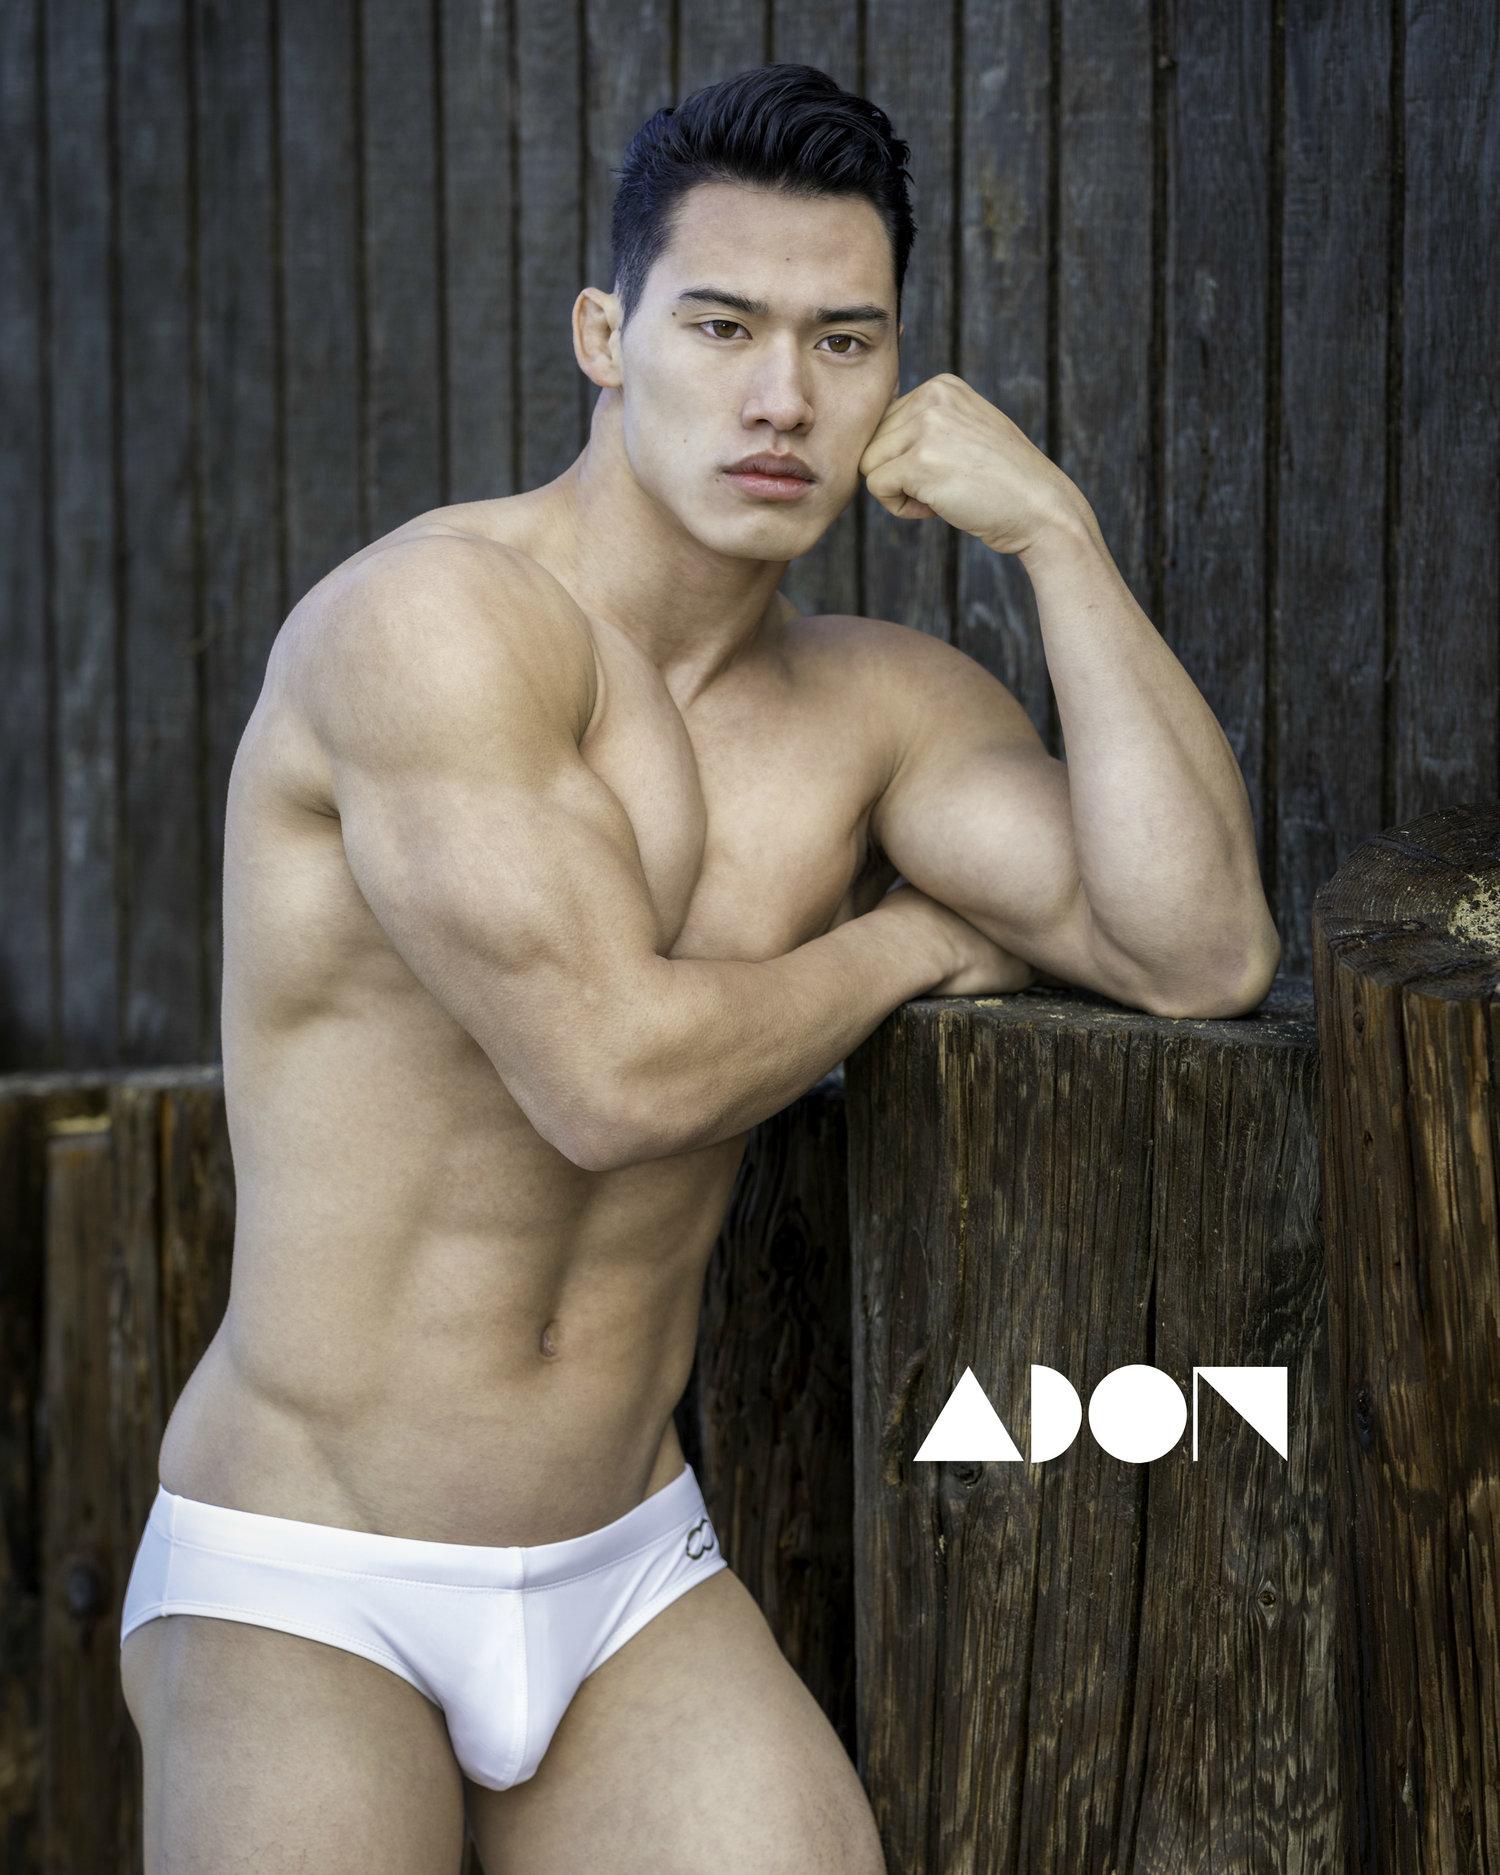 Adon Exclusive: Model Wilson Lai By Anthony Kosinchuk